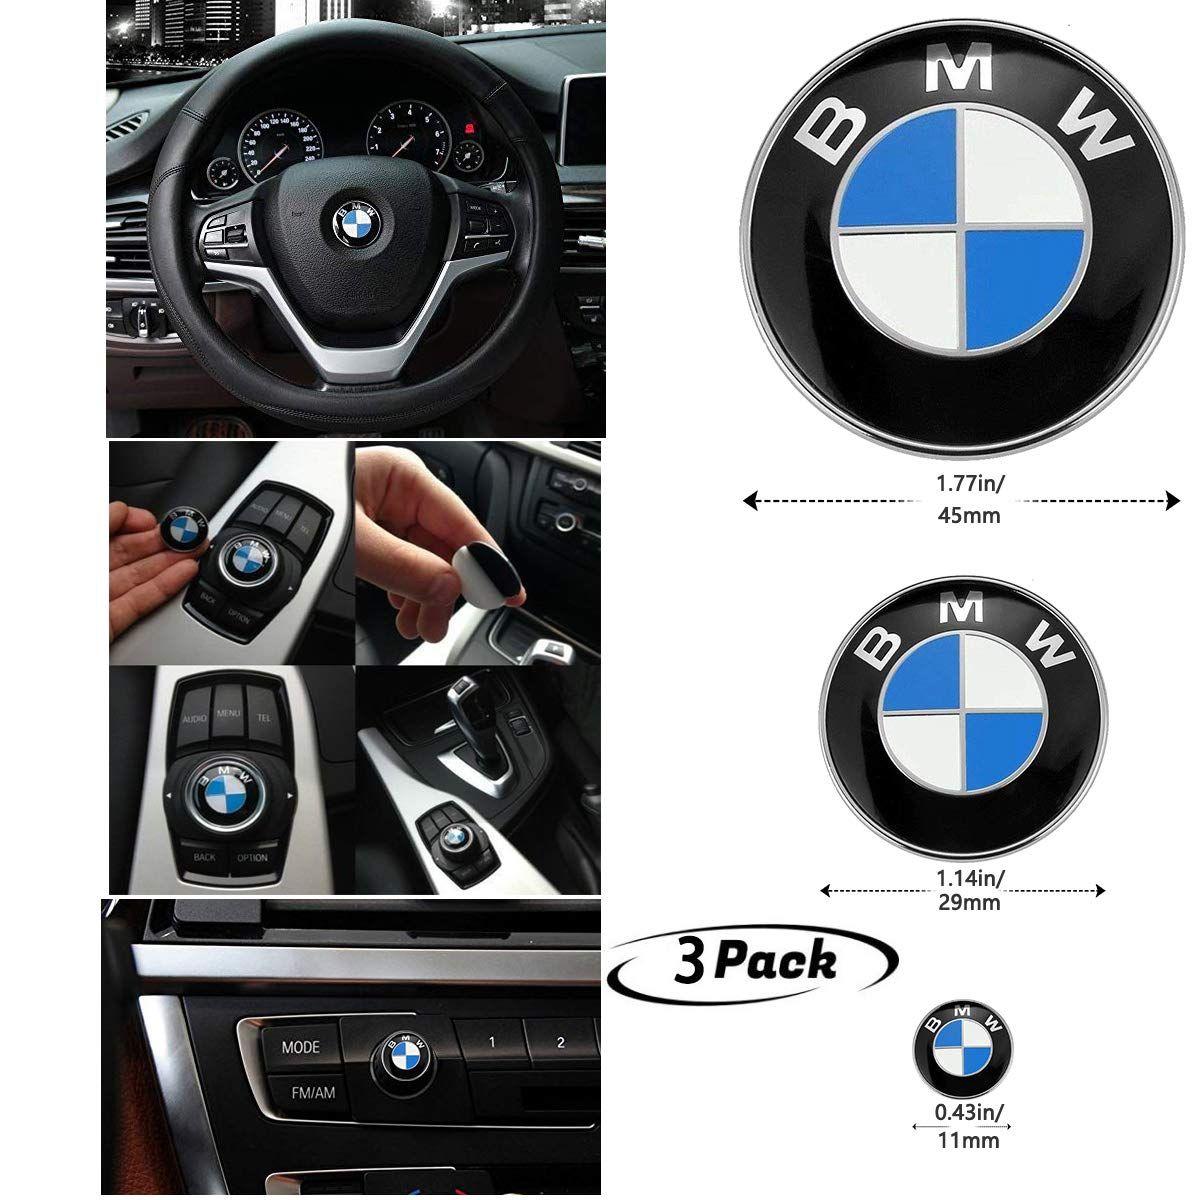 3piece Diy Bmw Steering Wheel Emblem Decal Bmw Multimedia Center